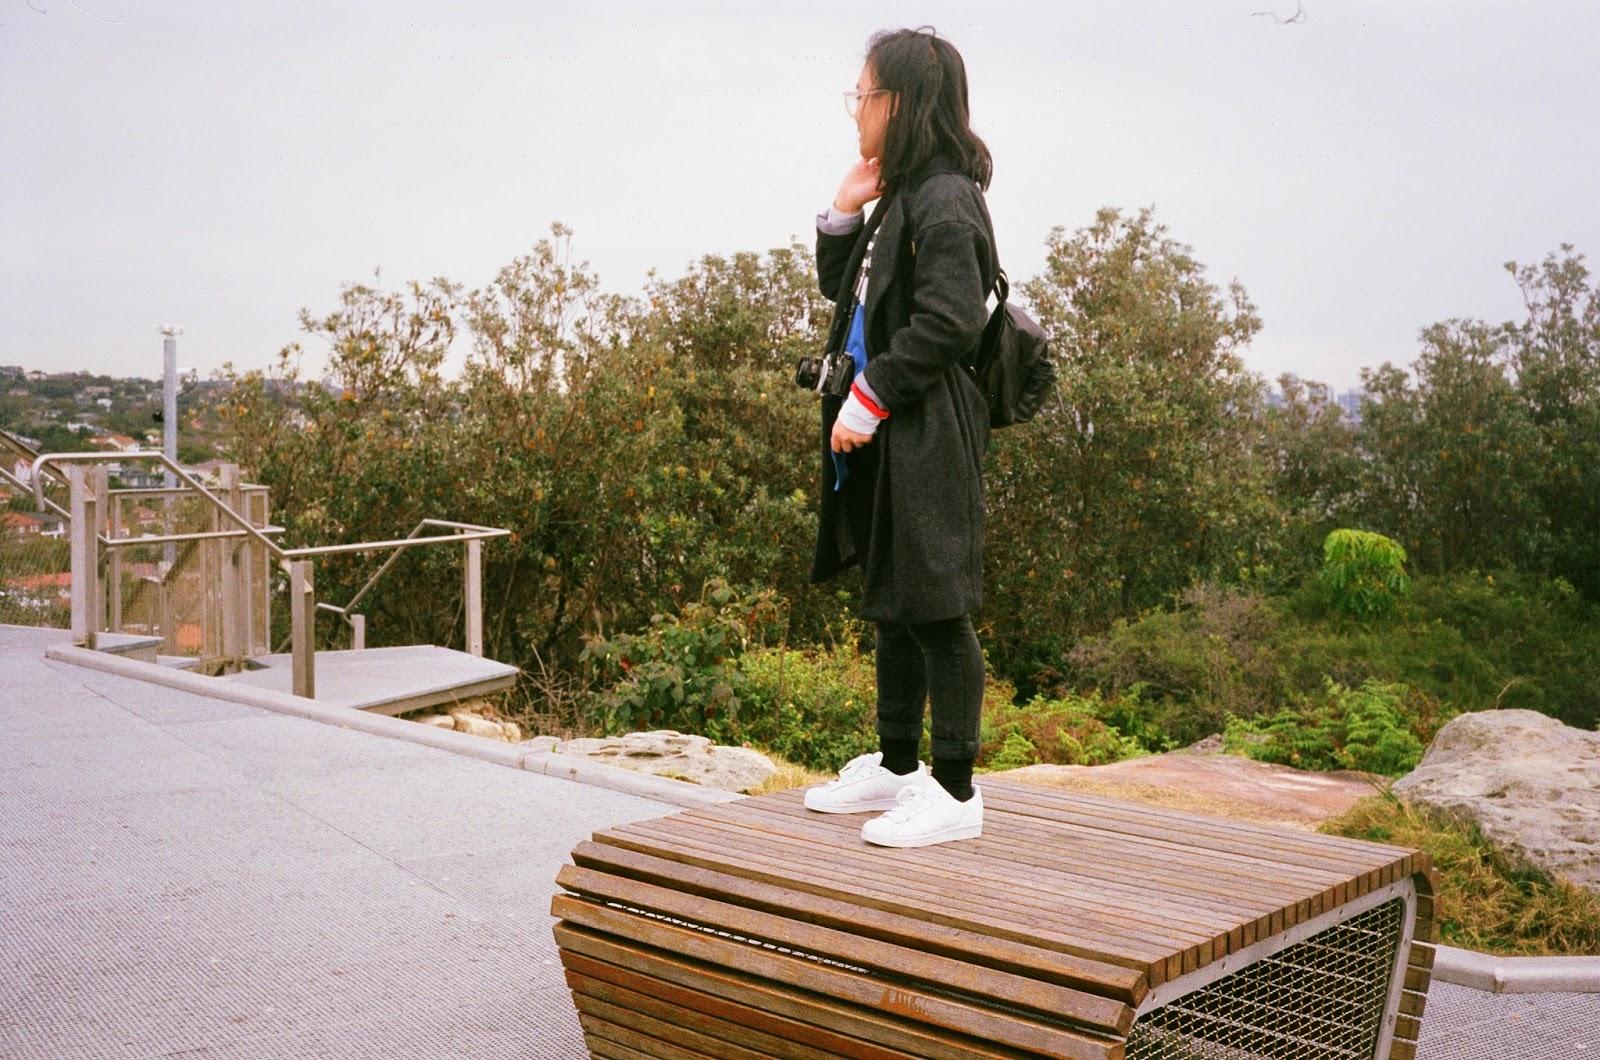 karen okuda, elashock, konichiwakaren, thoughts, feelings, personal blog, film, 35mm film, photography, analogue photography, nina nguyen